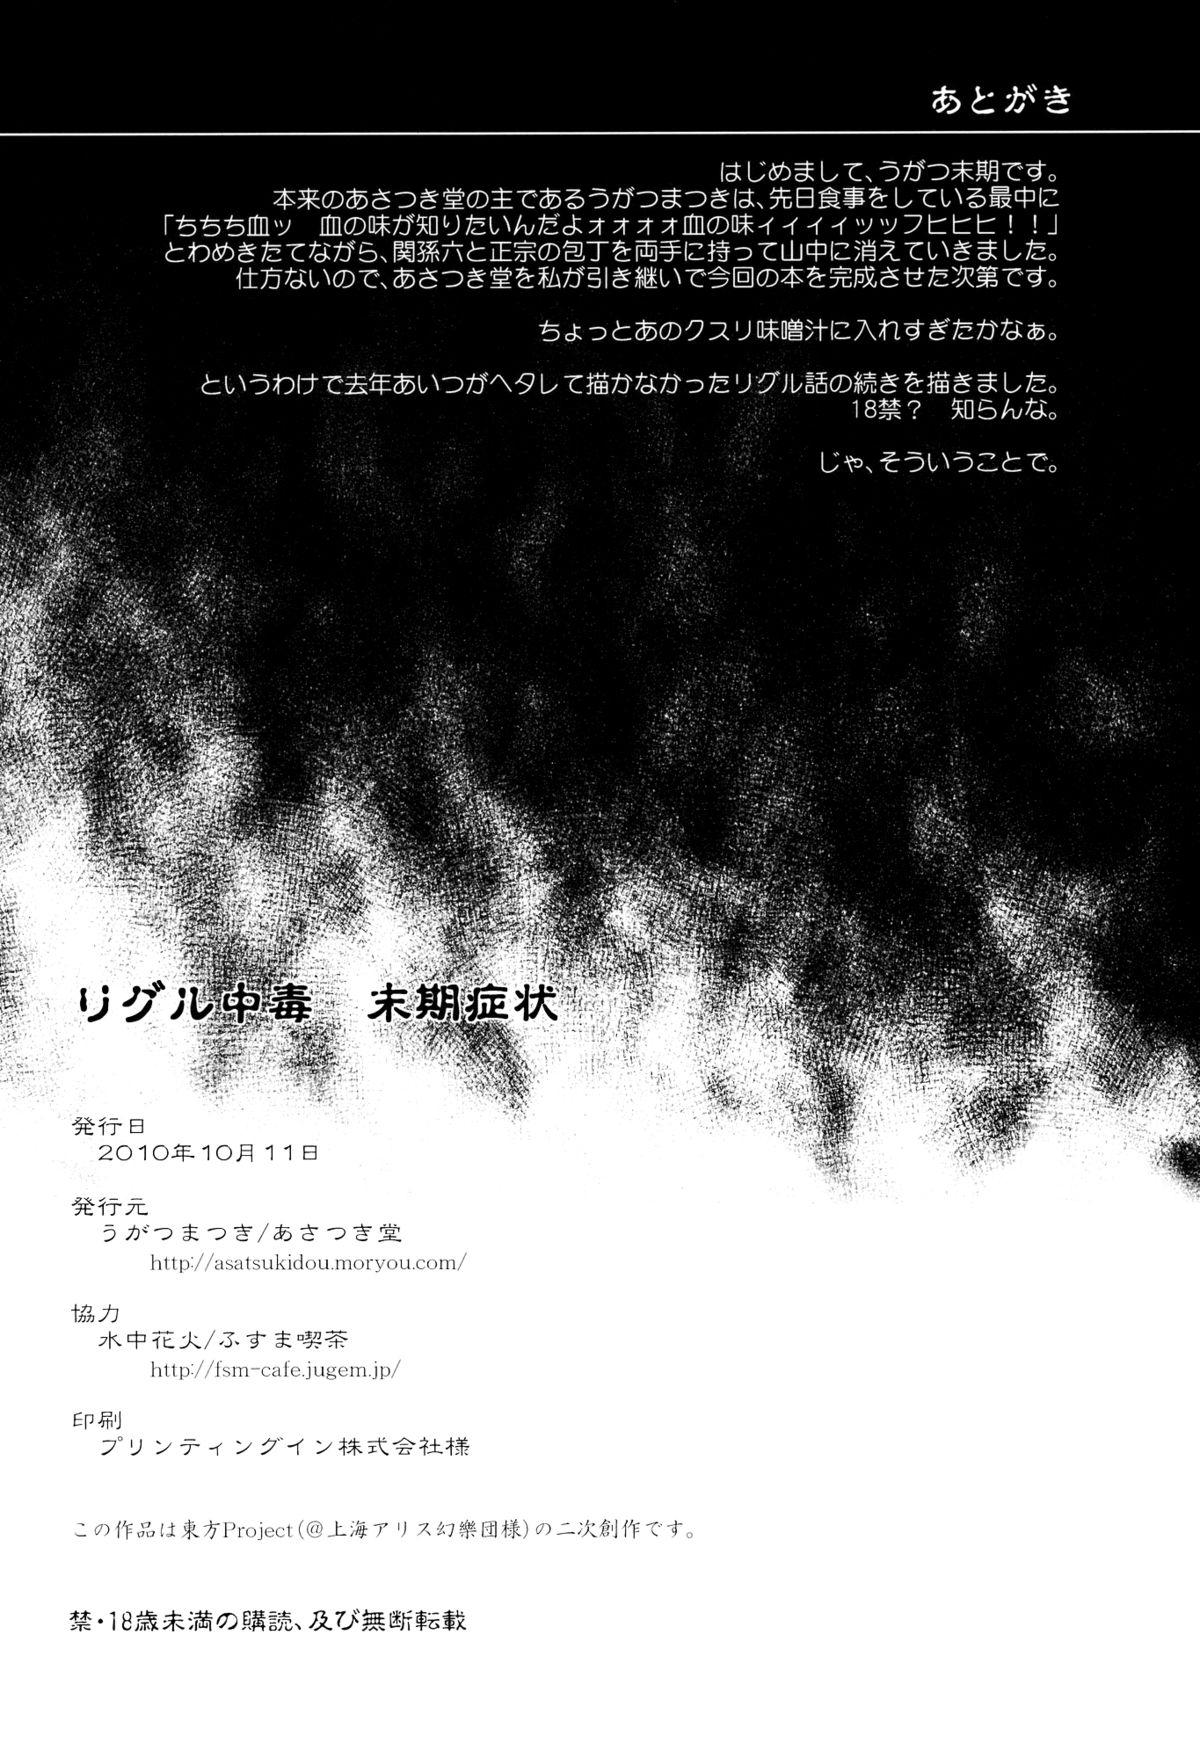 HentaiVN.net - Ảnh 22 - Wriggle chuudoku makki shoujou - Chap 2